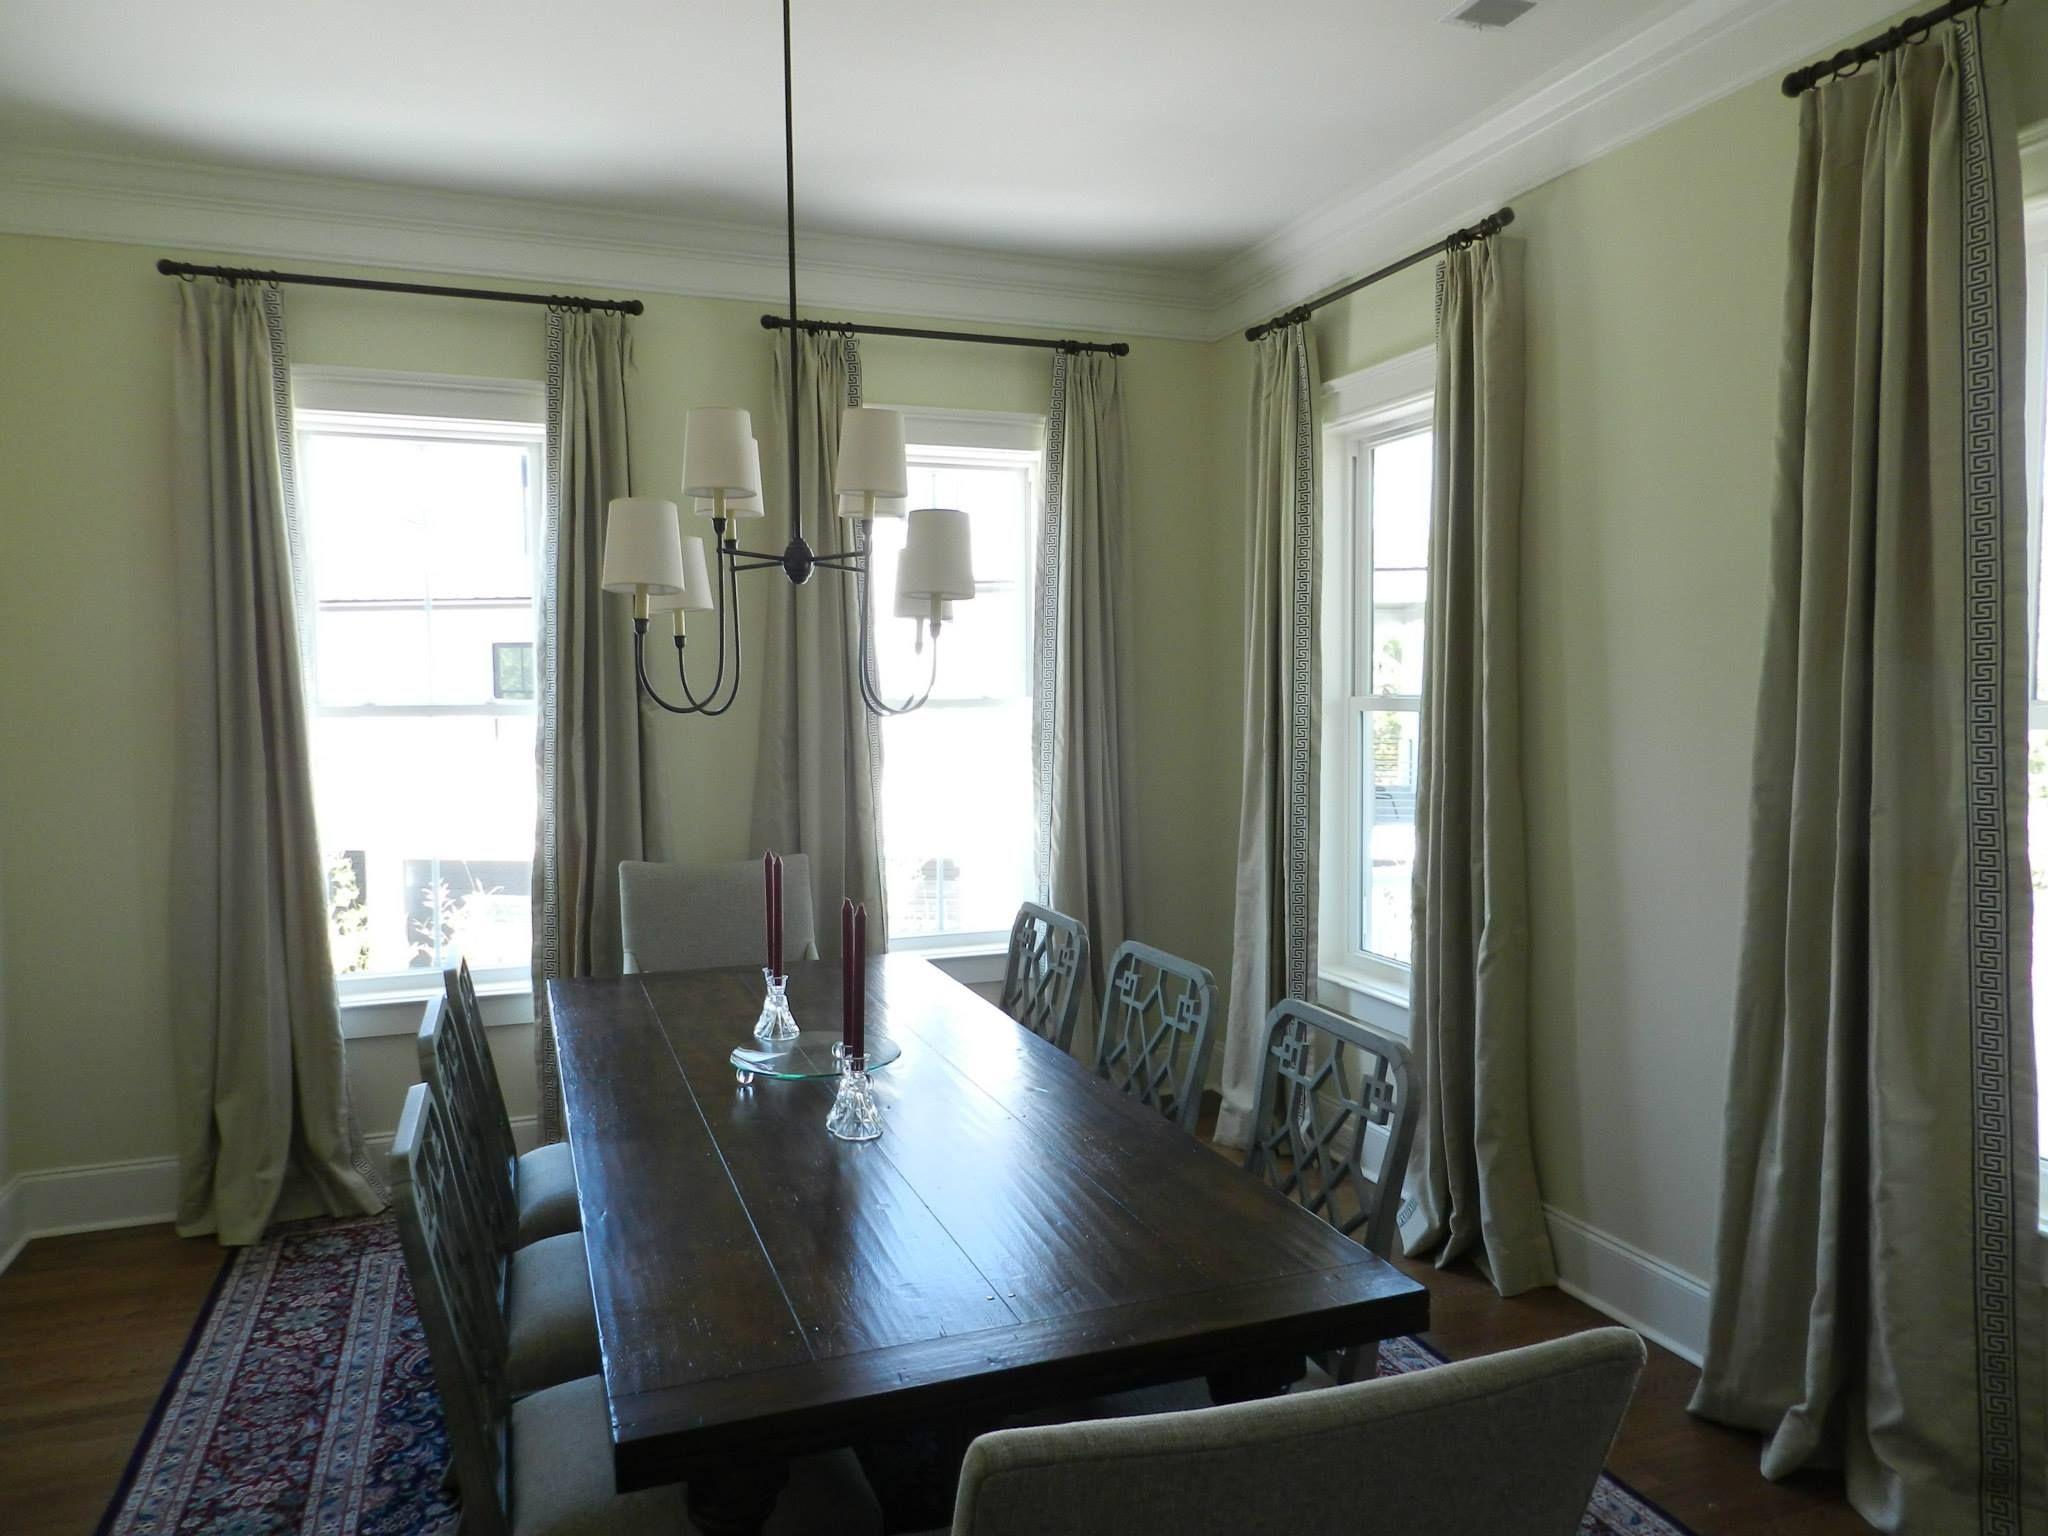 Laura Ramsey Furniture And Interiors | Dining Room In Progress.  #lauraramseyinteriors #charleston #